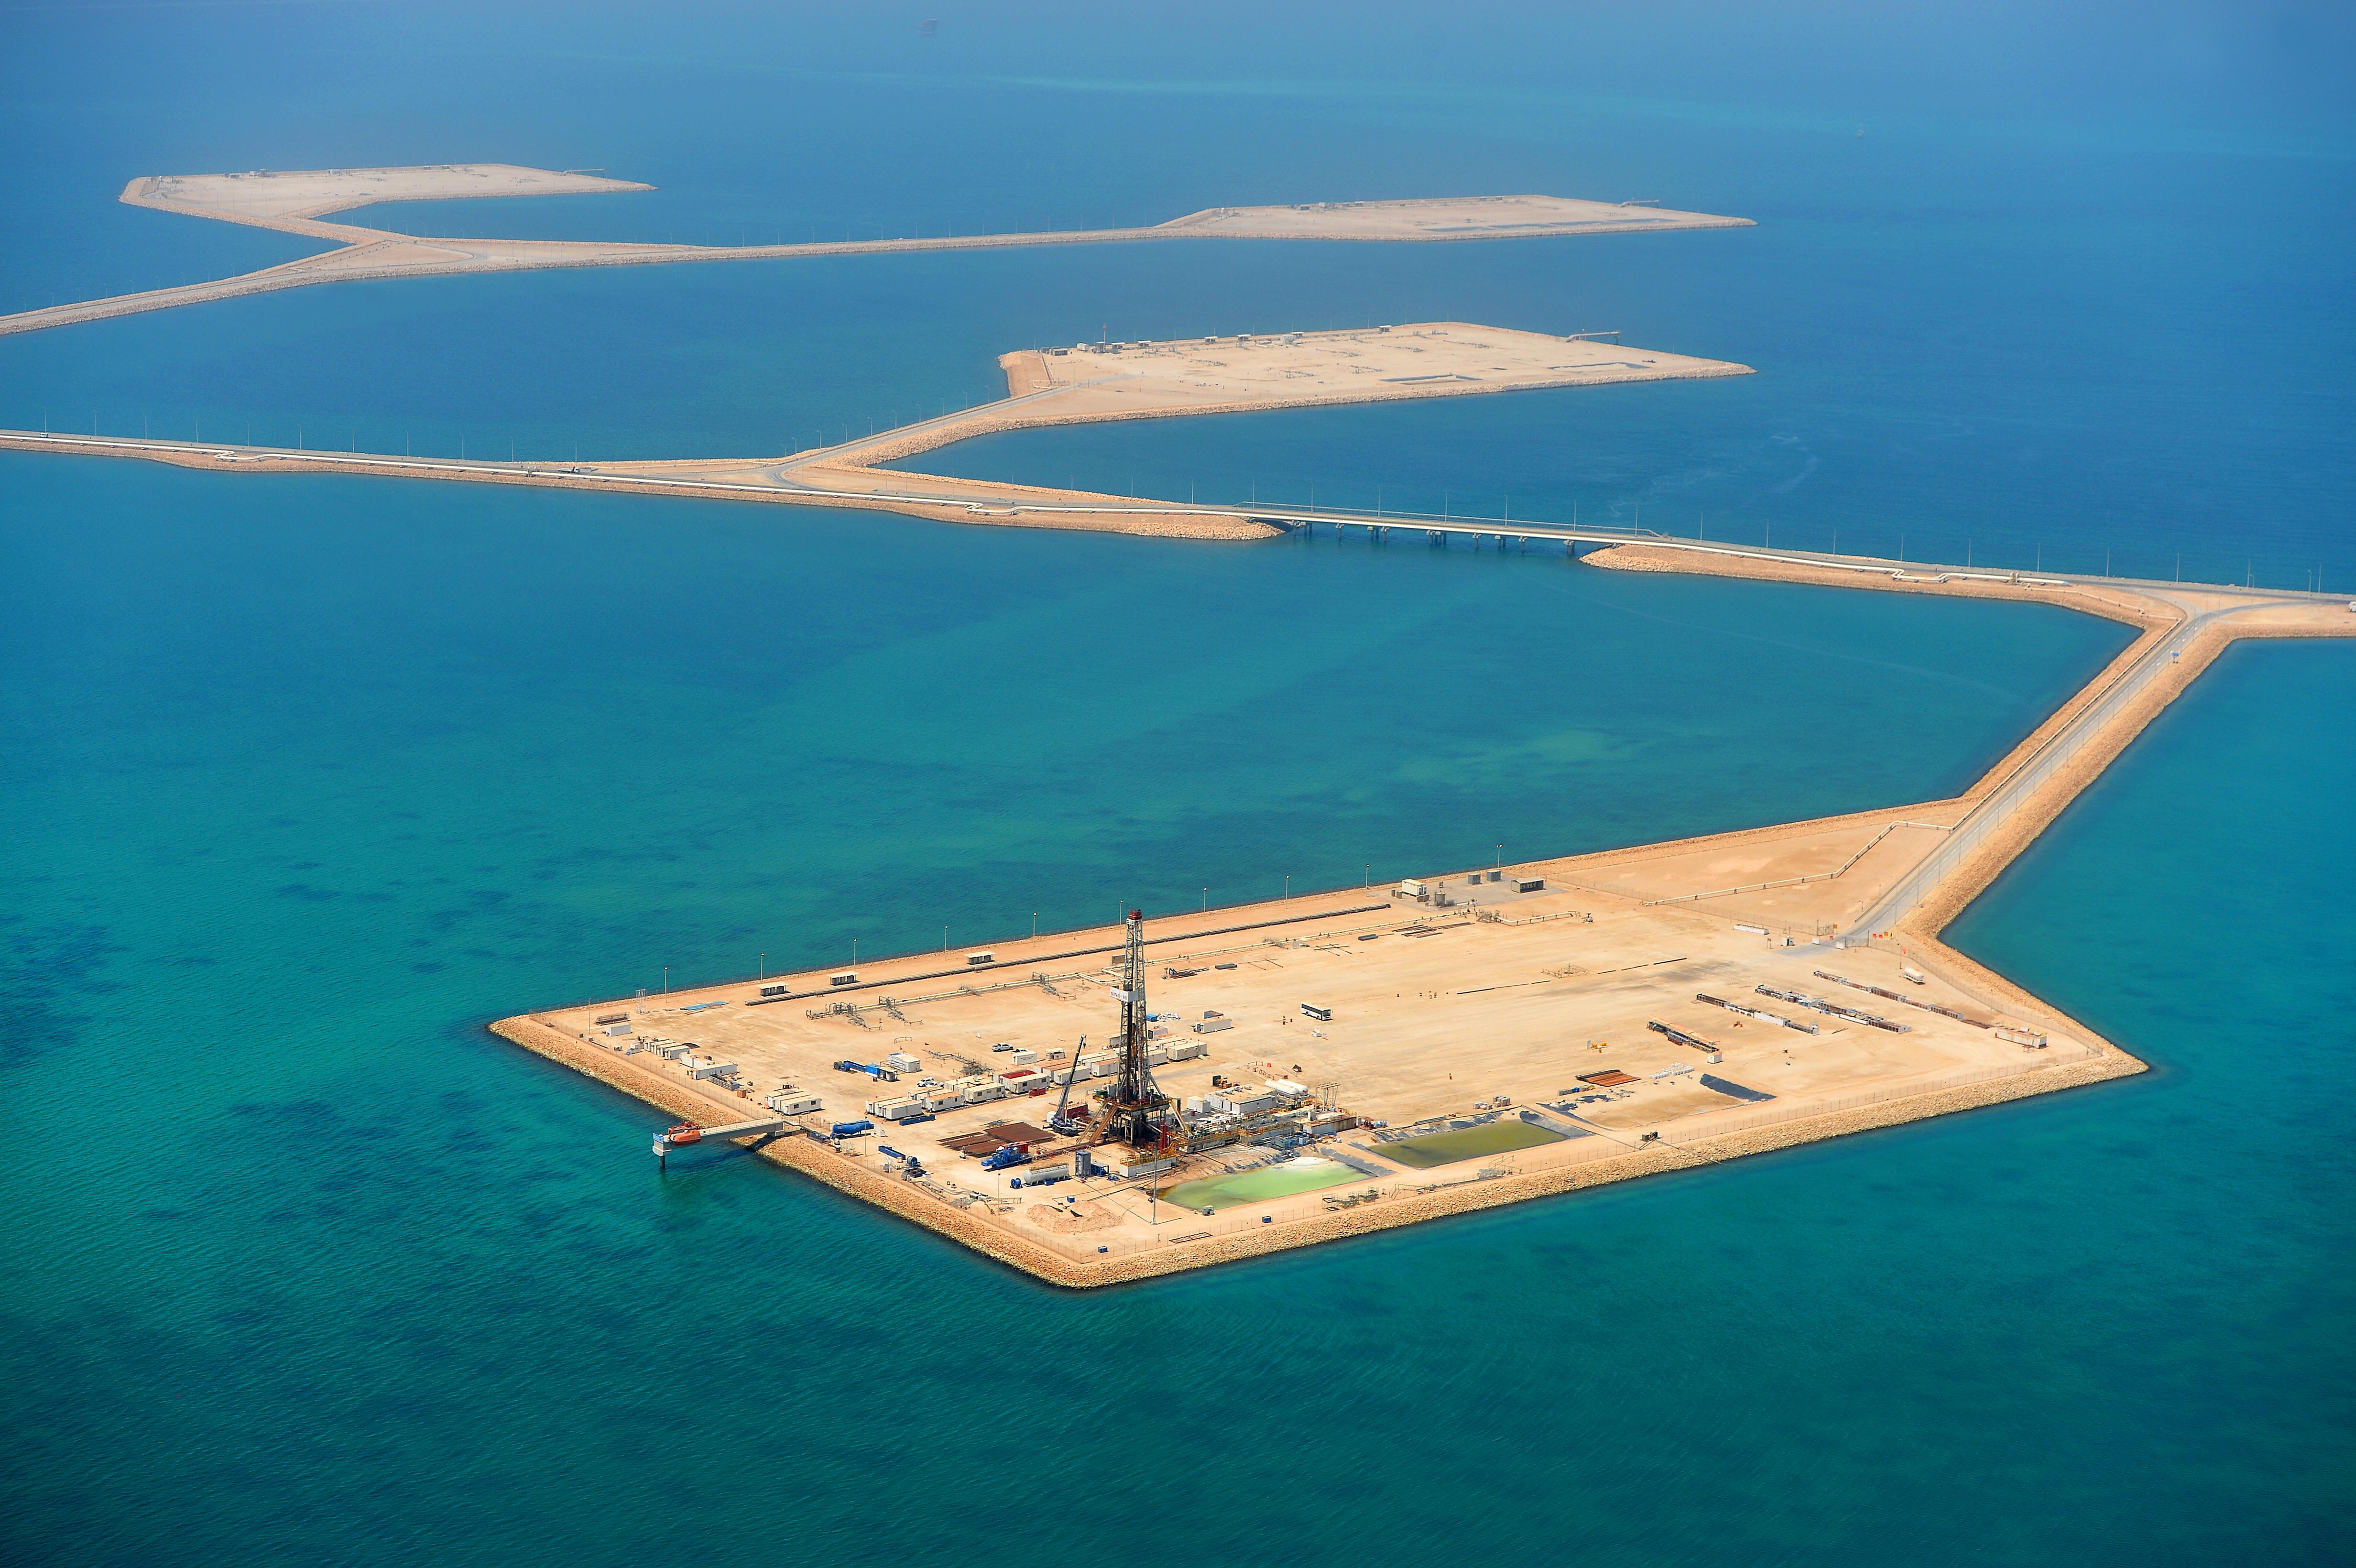 A triumph of engineering, nature and human spirit - Saudi Aramco